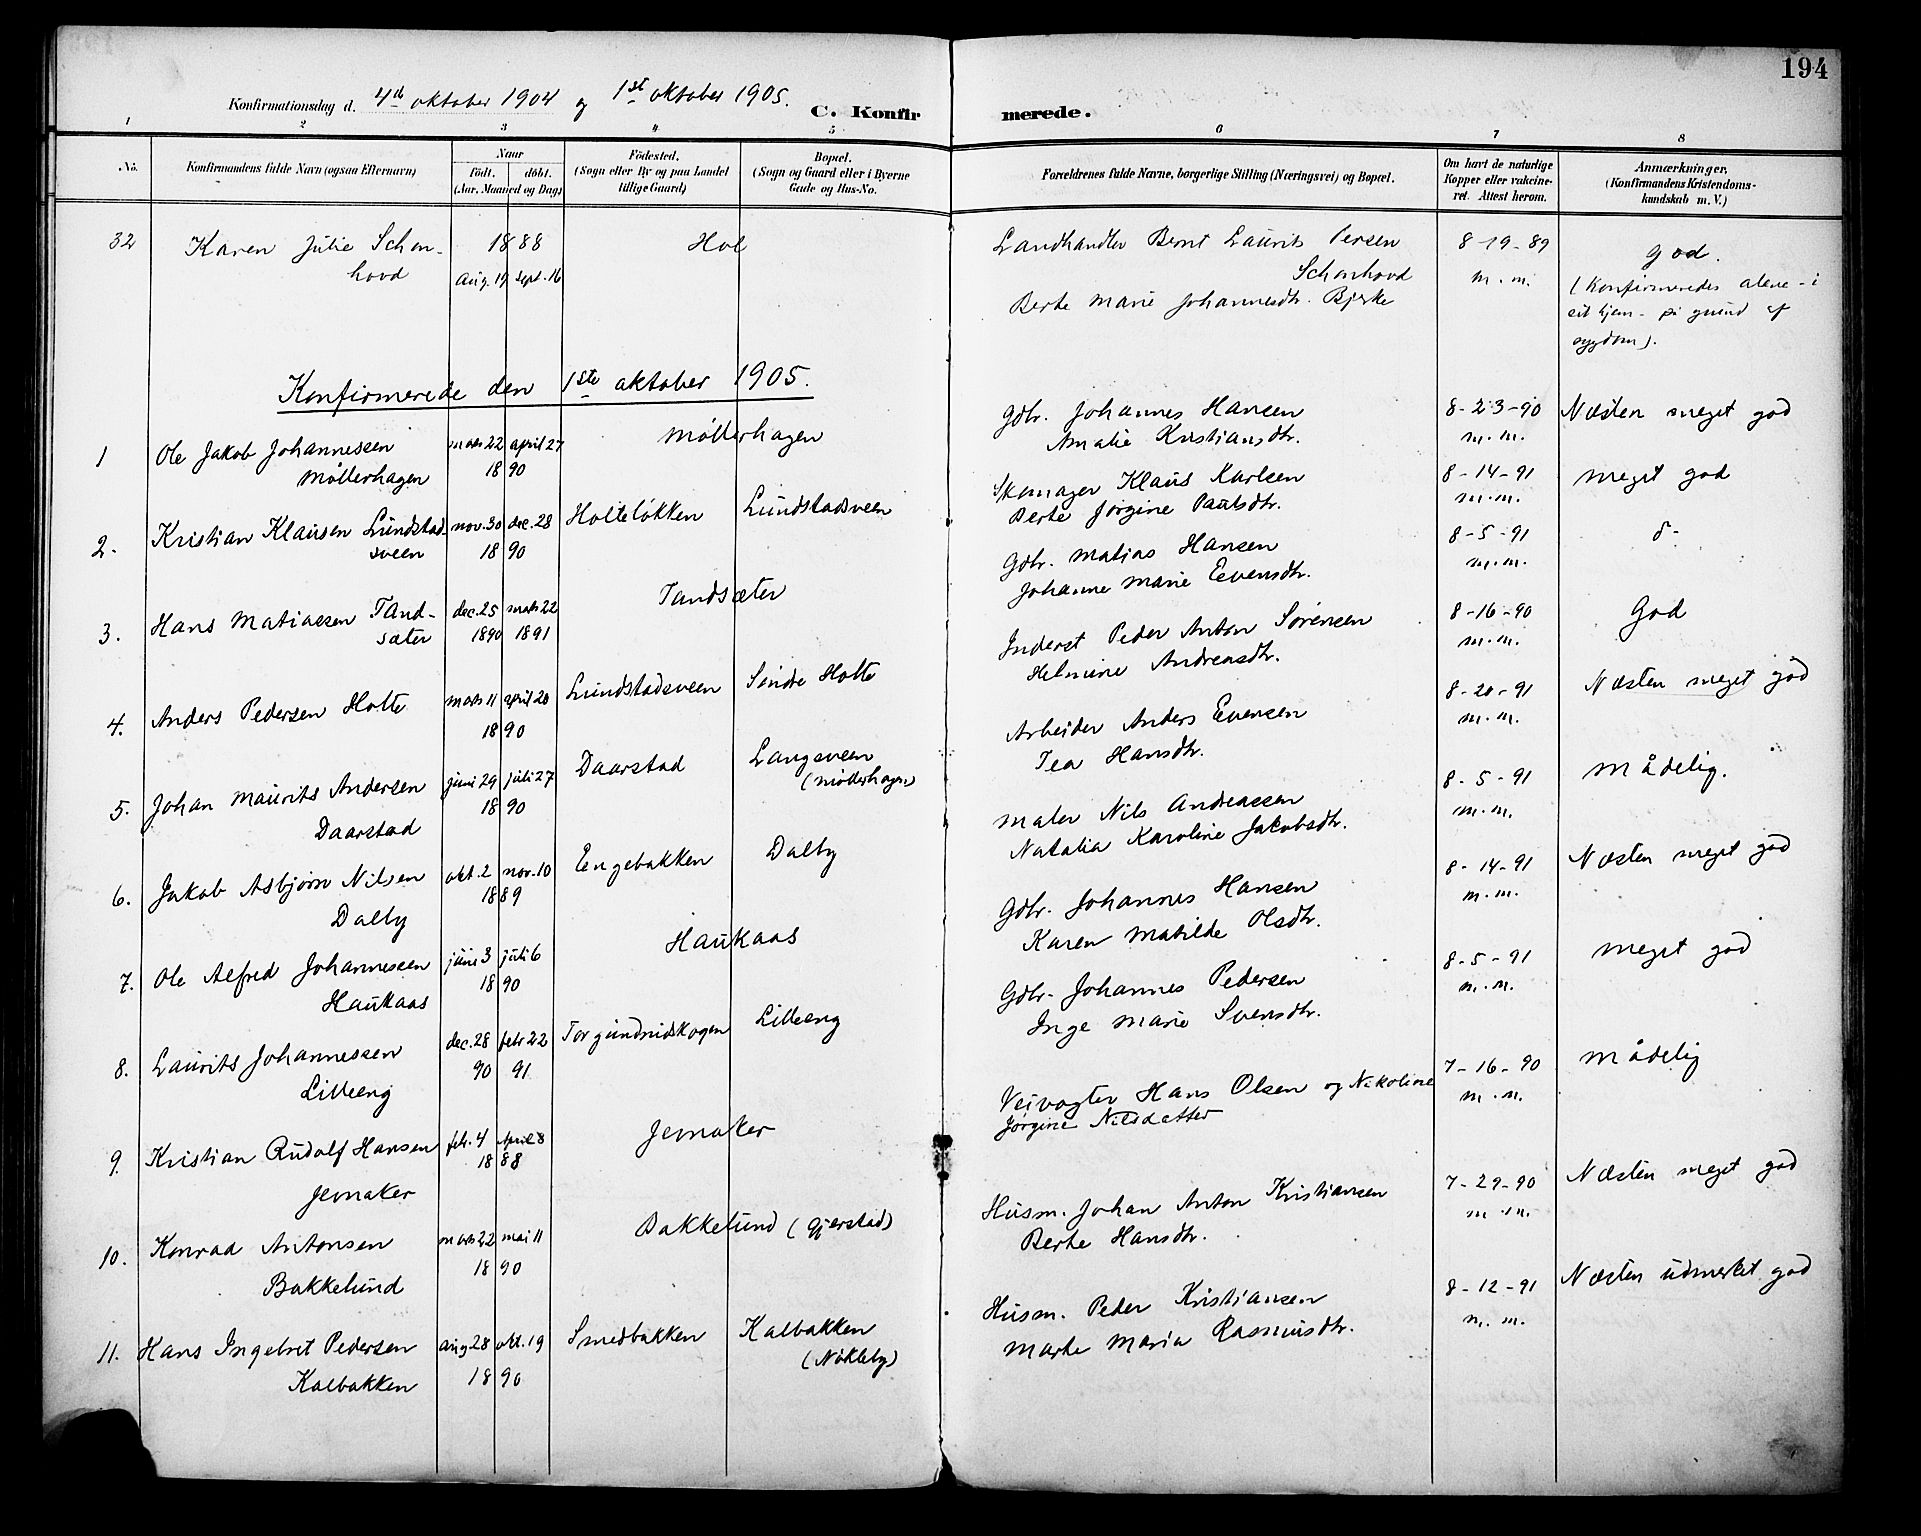 SAH, Vestre Toten prestekontor, H/Ha/Haa/L0013: Ministerialbok nr. 13, 1895-1911, s. 194